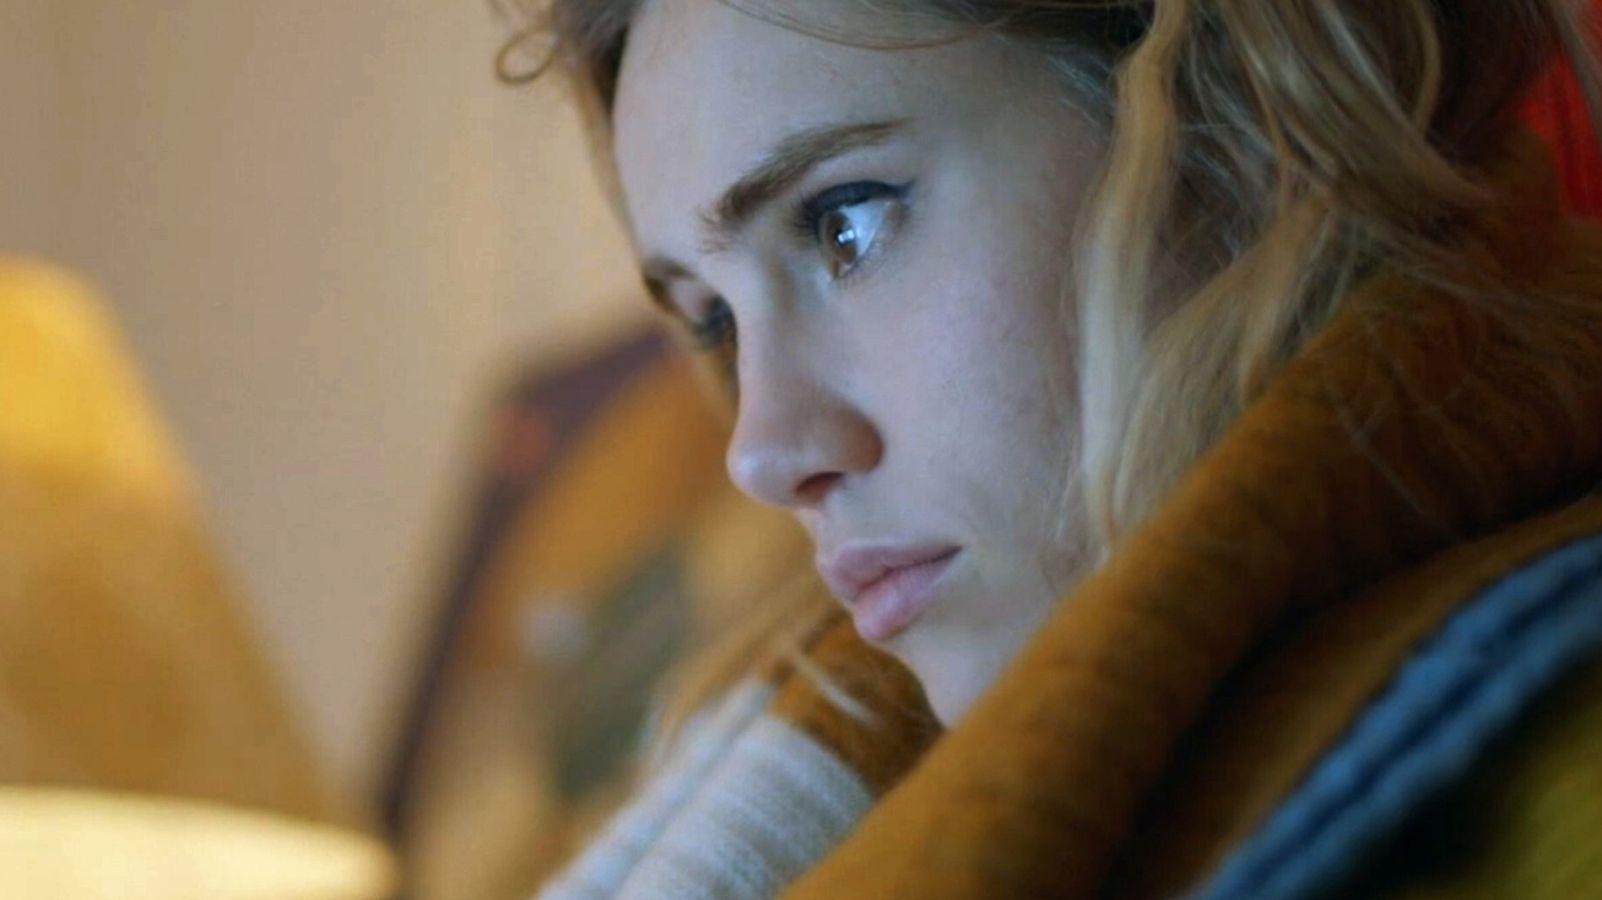 Kampf gegen Corona-Frust: Was kann ich tun? - BR24